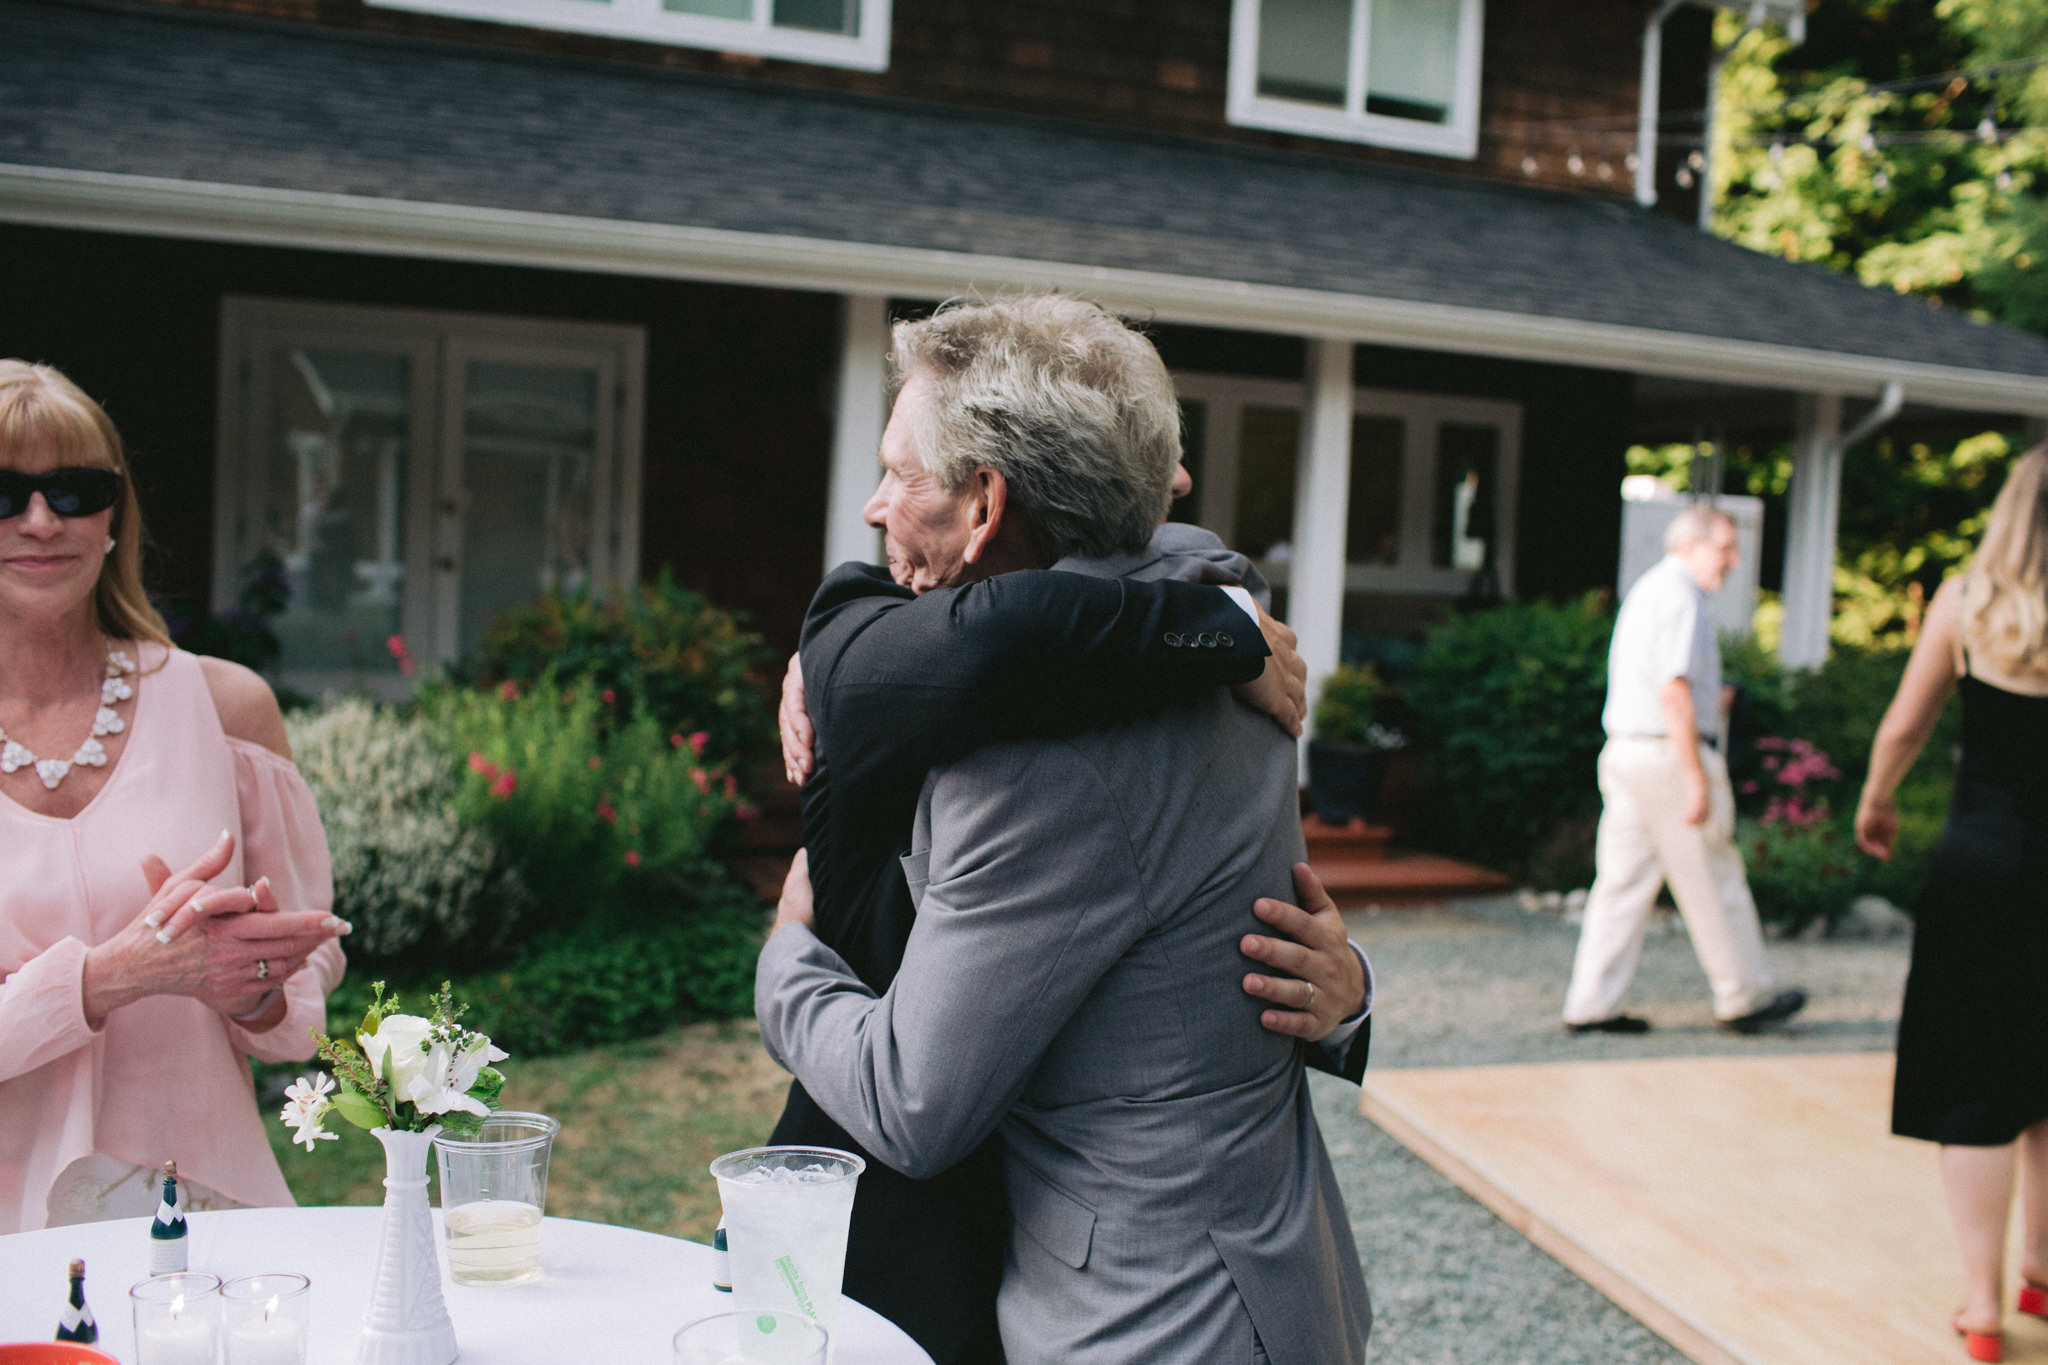 Backyard-Bainbridge-Island-Wedding-Alycia-Lovell-Photography-164.JPG